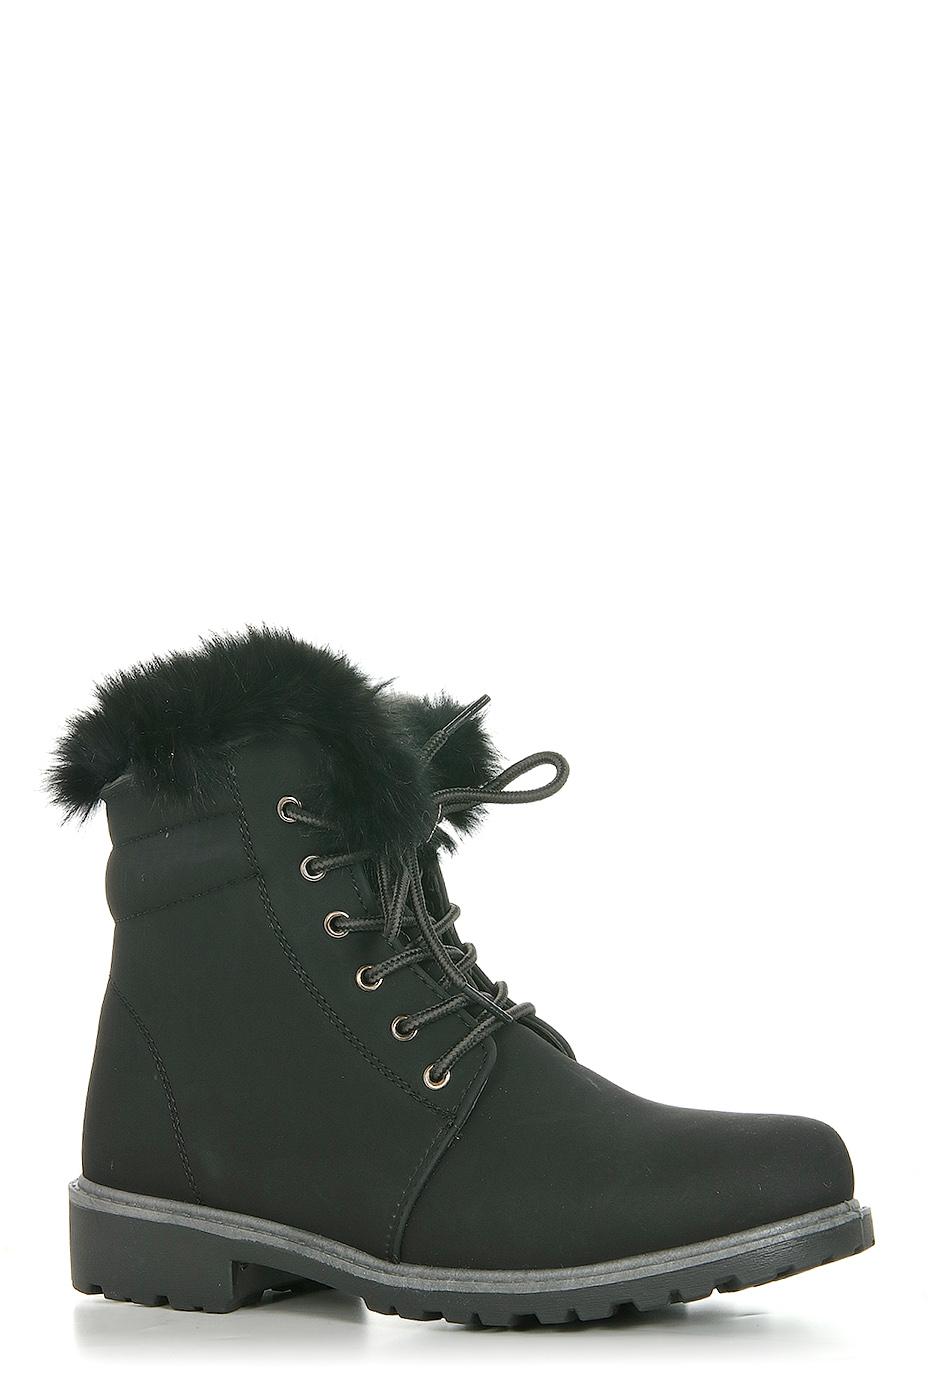 Ботинки TOPLAND2322-PB72504B/BLACK